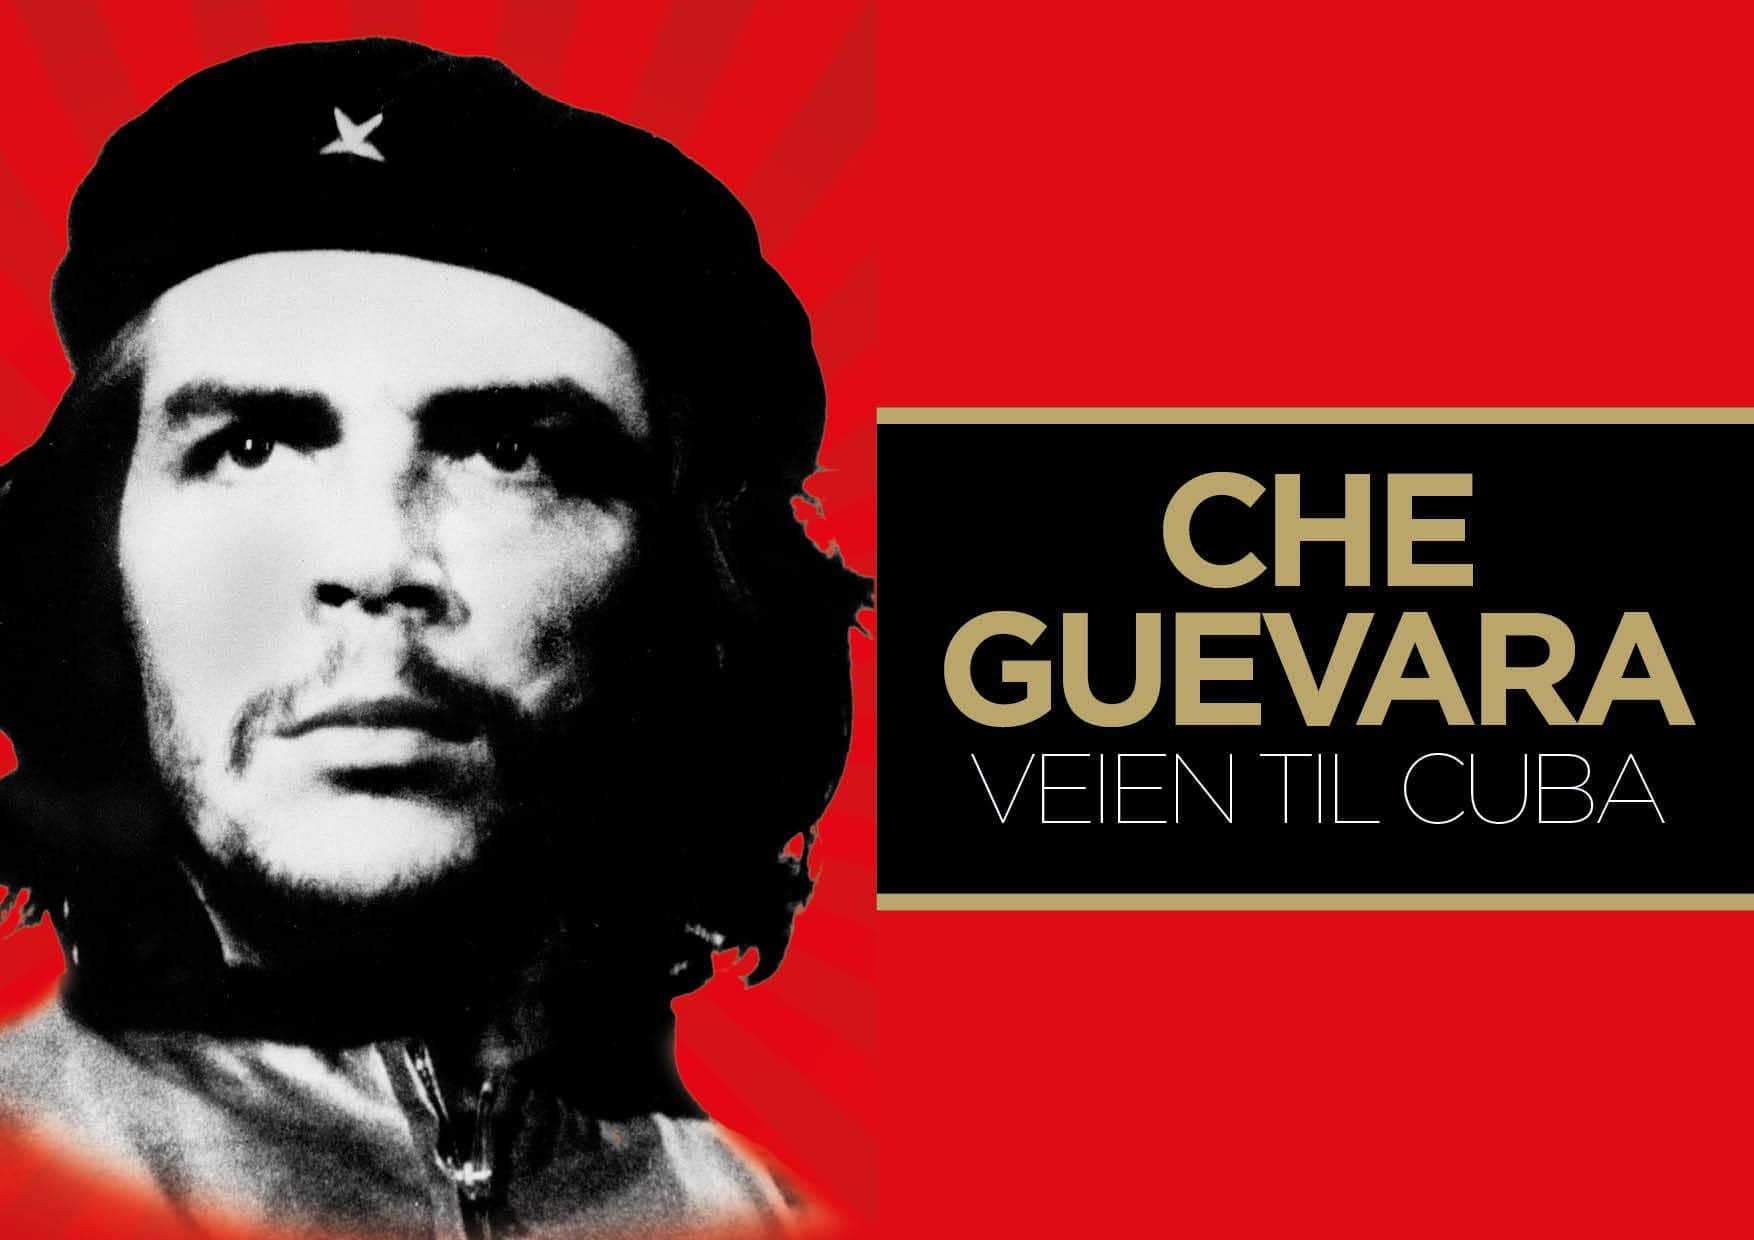 Che Guevara – Veien til Cuba